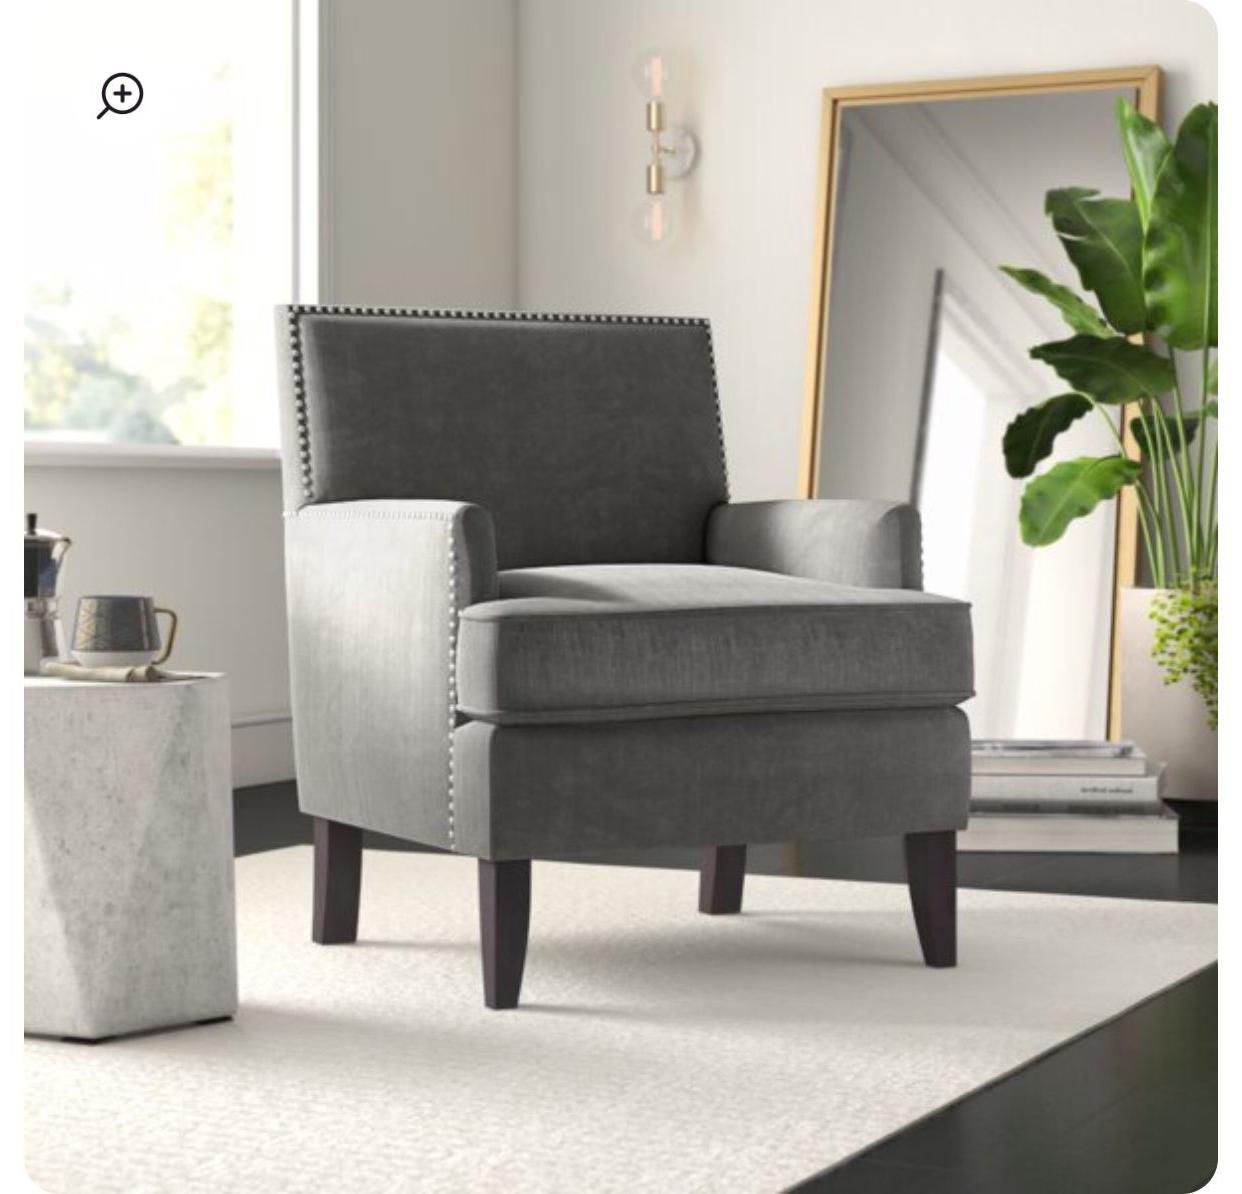 Furniture In Favorite Molinari Swivel Barrel Chairs (View 15 of 20)